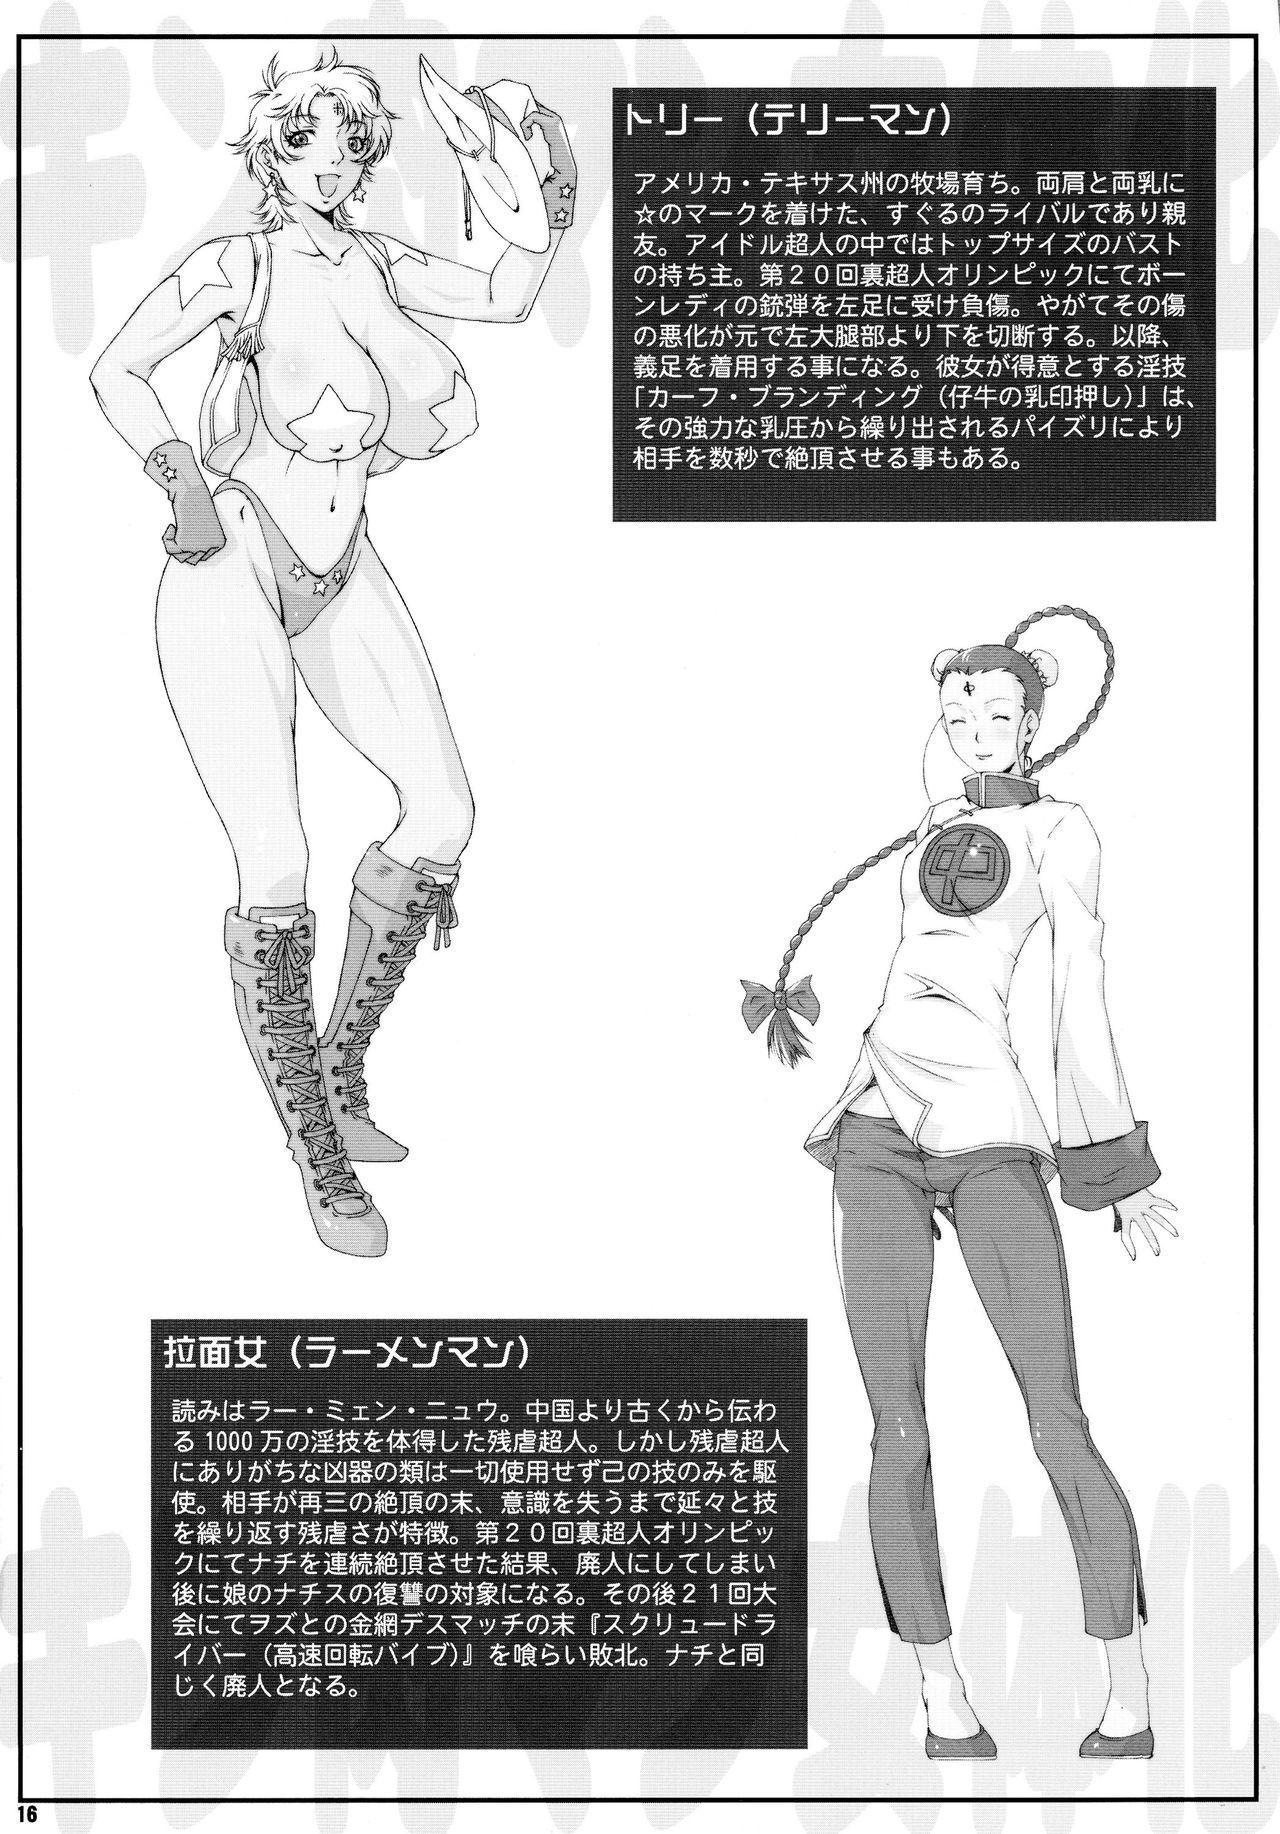 Misoka no 5 15